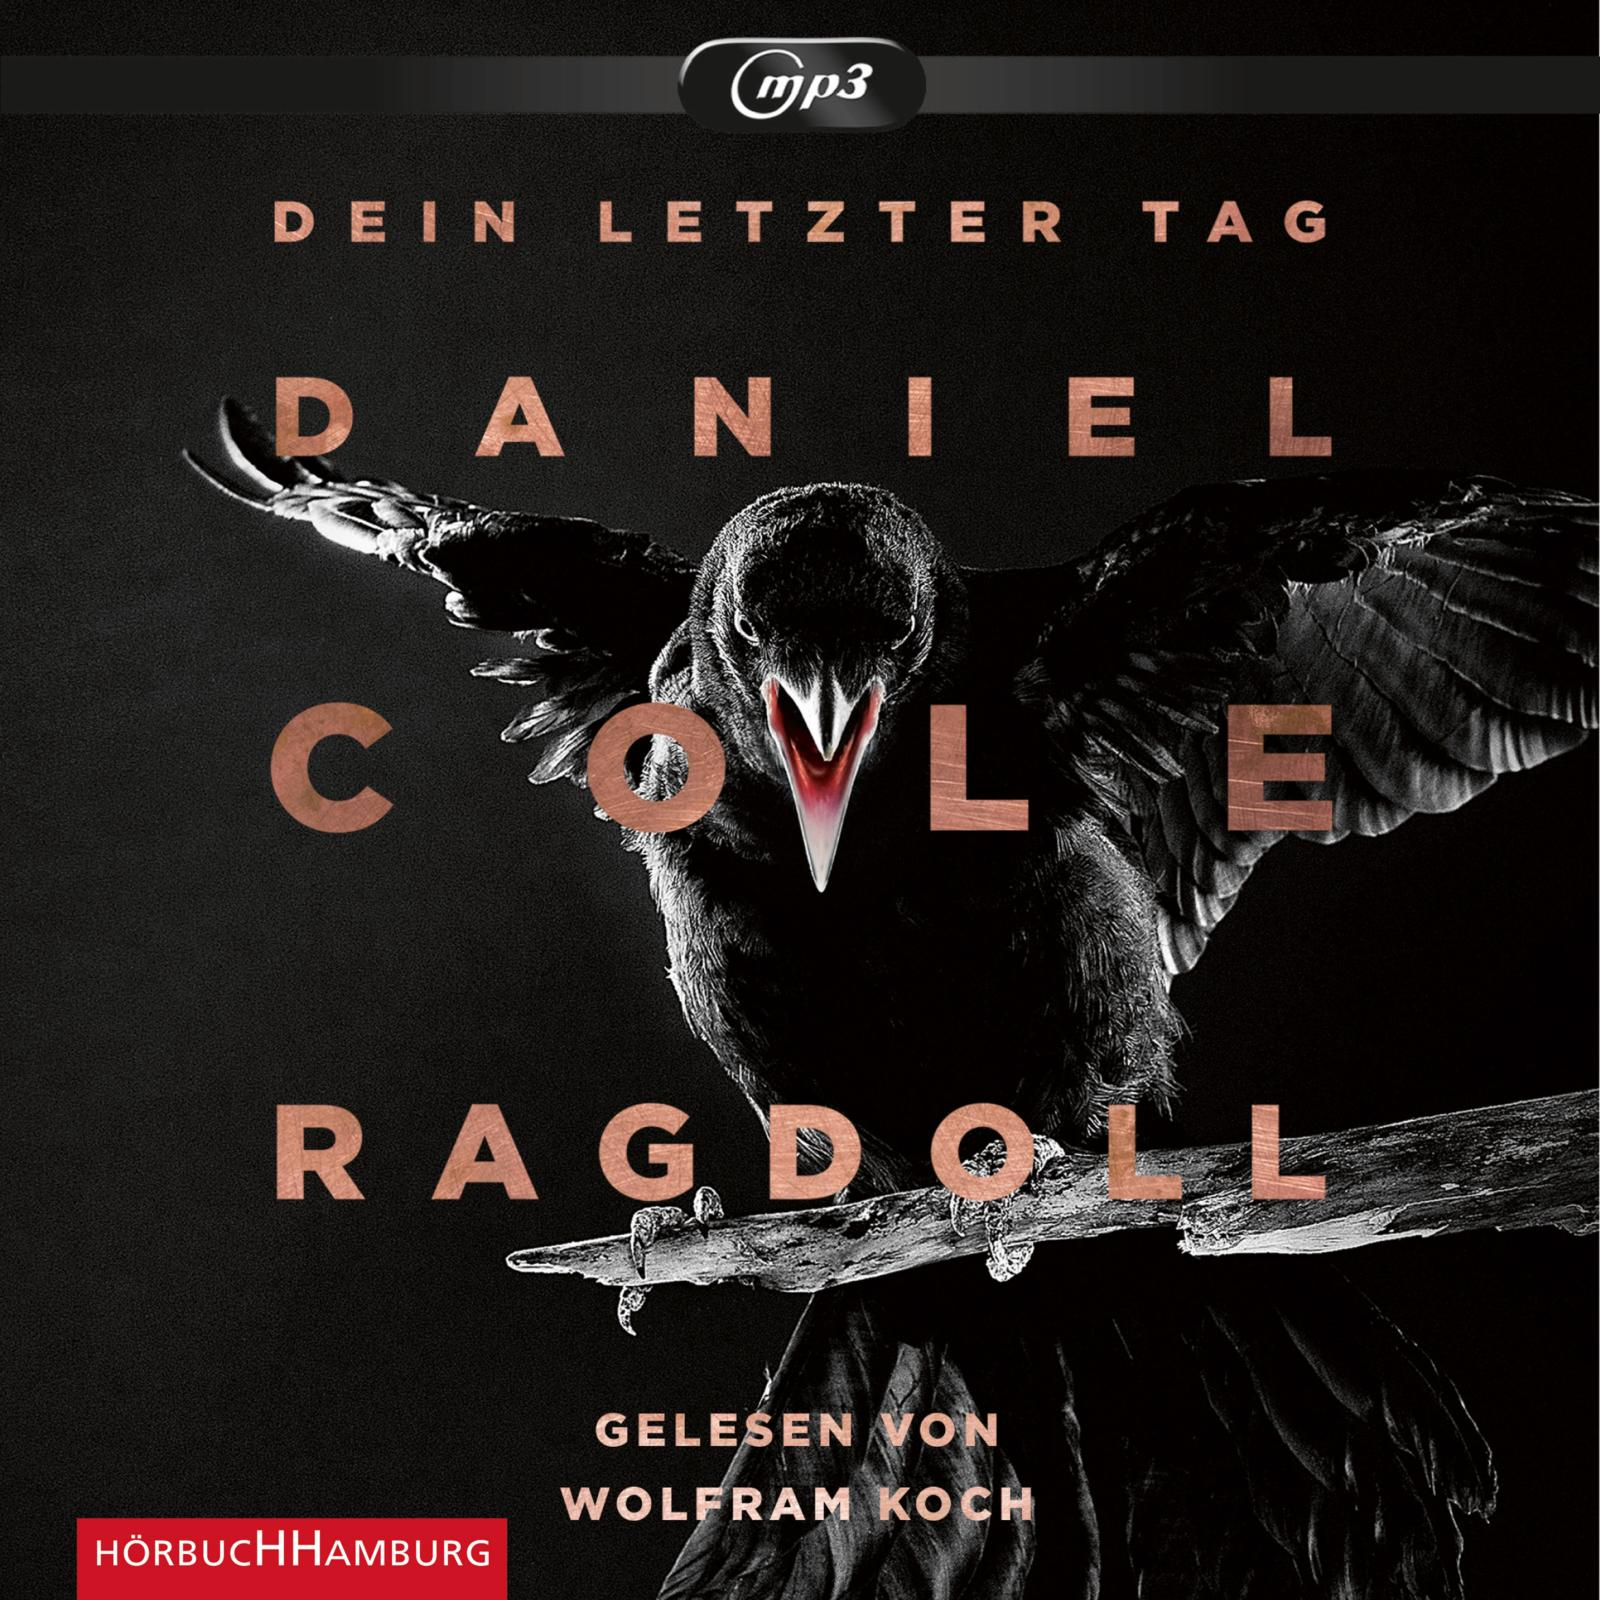 Cover für das Ragdoll - Dein letzter Tag Hörbuch